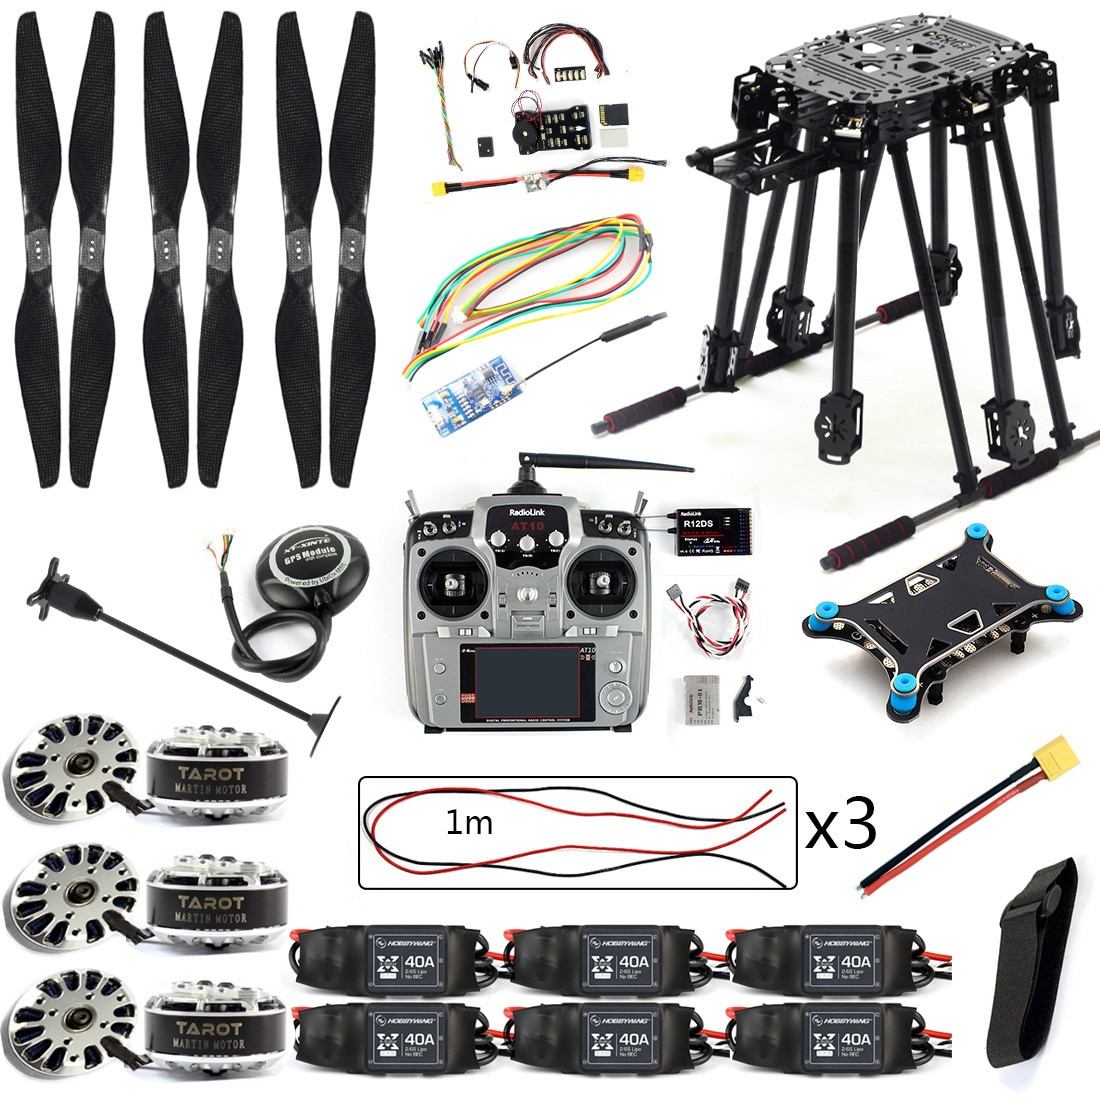 DIY Kit PIX4 Flight Control ZD850 Rahmen Kit M8N GPS Fernbedienung Radio Telemetrie ESC Motor Requisiten RC 6- achse Drone F19833-D